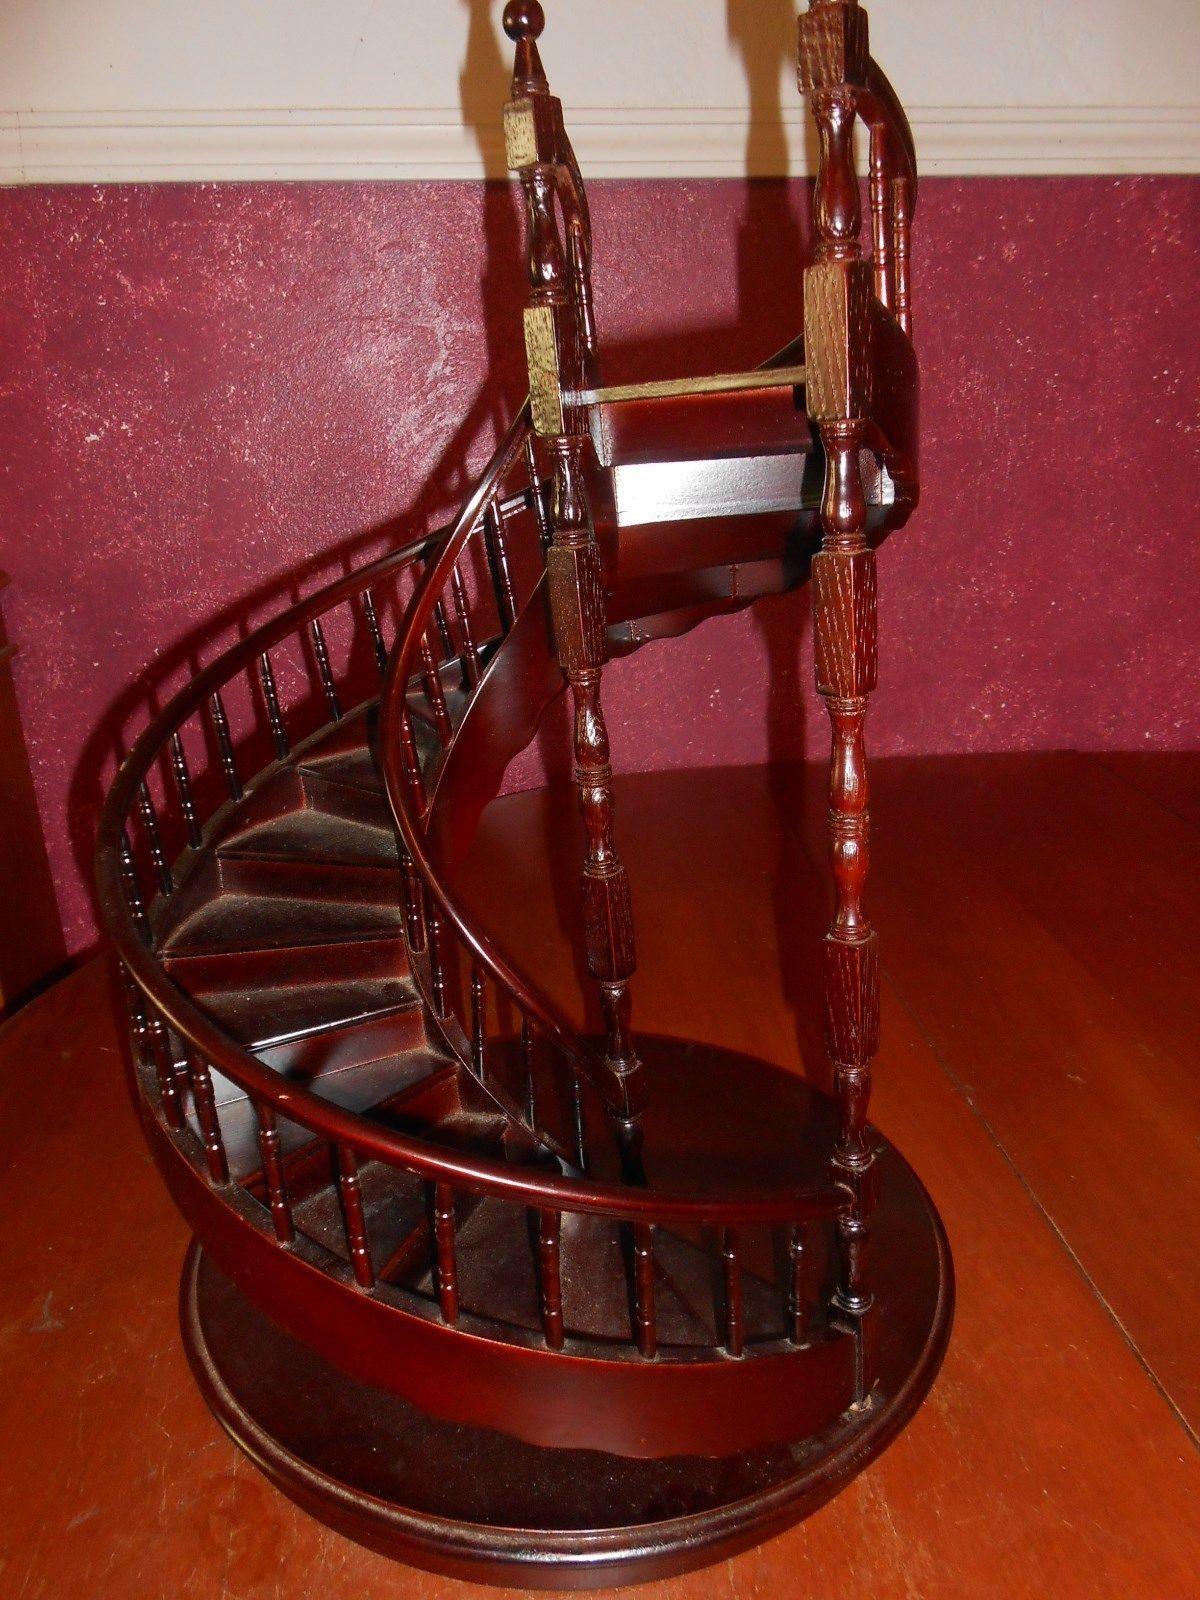 Best Wooden Spiral Staircase For Display Ebay Spiral 640 x 480